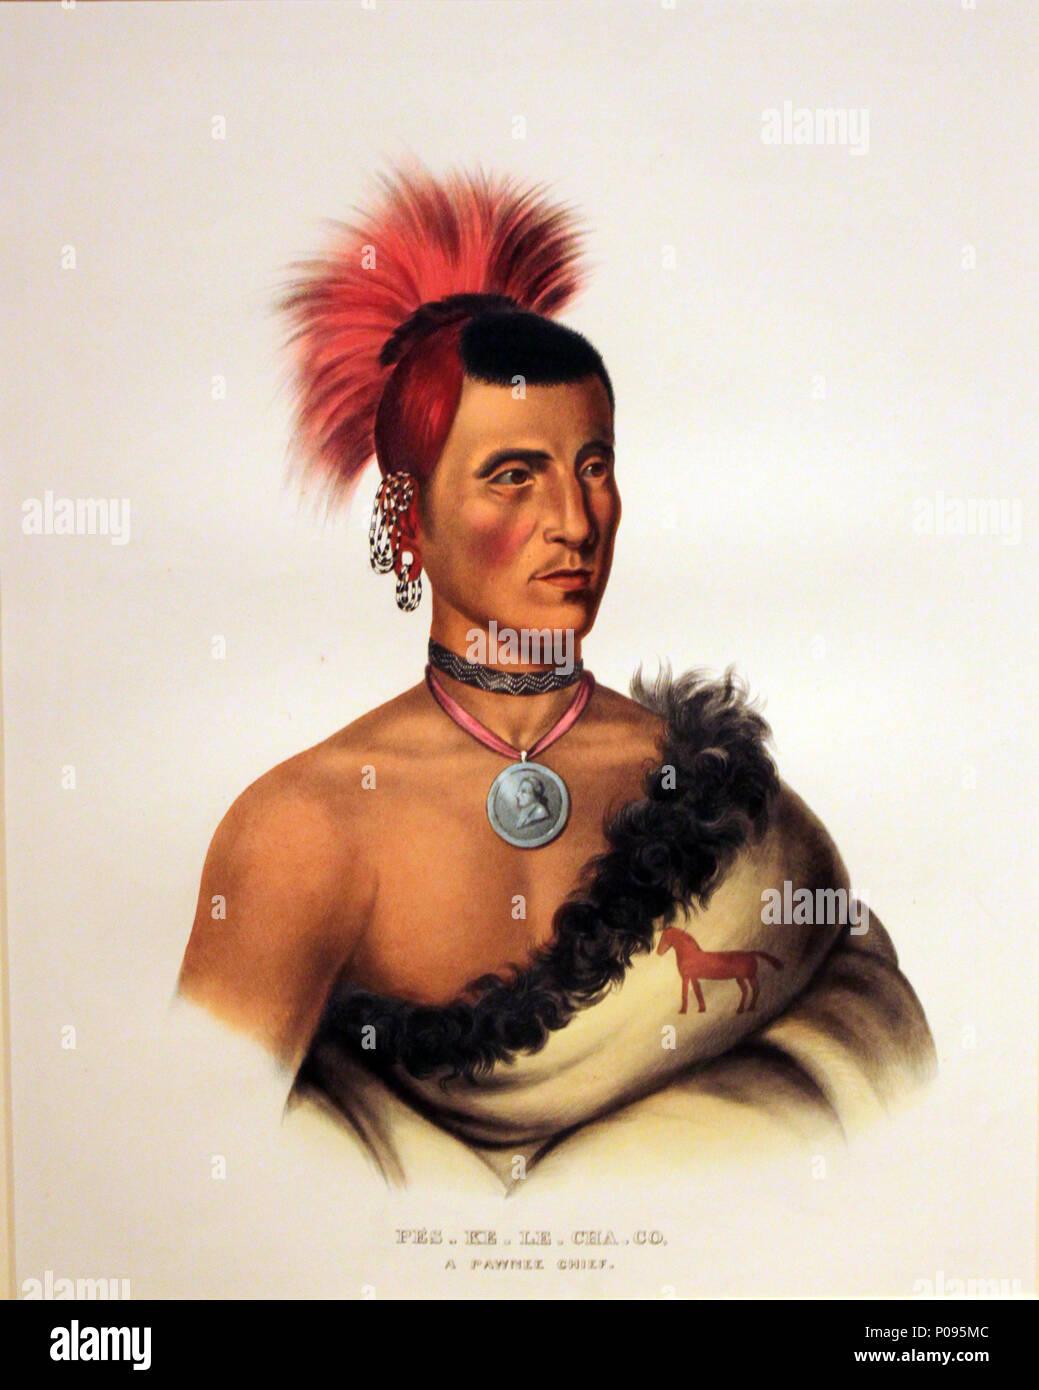 .  English: Pawnee Chief Pes Ke Le Cha Co Deutsch: Pawnee Häuptling Pes Ke Le Cha Co . 1833 20 1833 Catlin Pes Ke Le Cha Co, Pawnee Chief anagoria Stock Photo